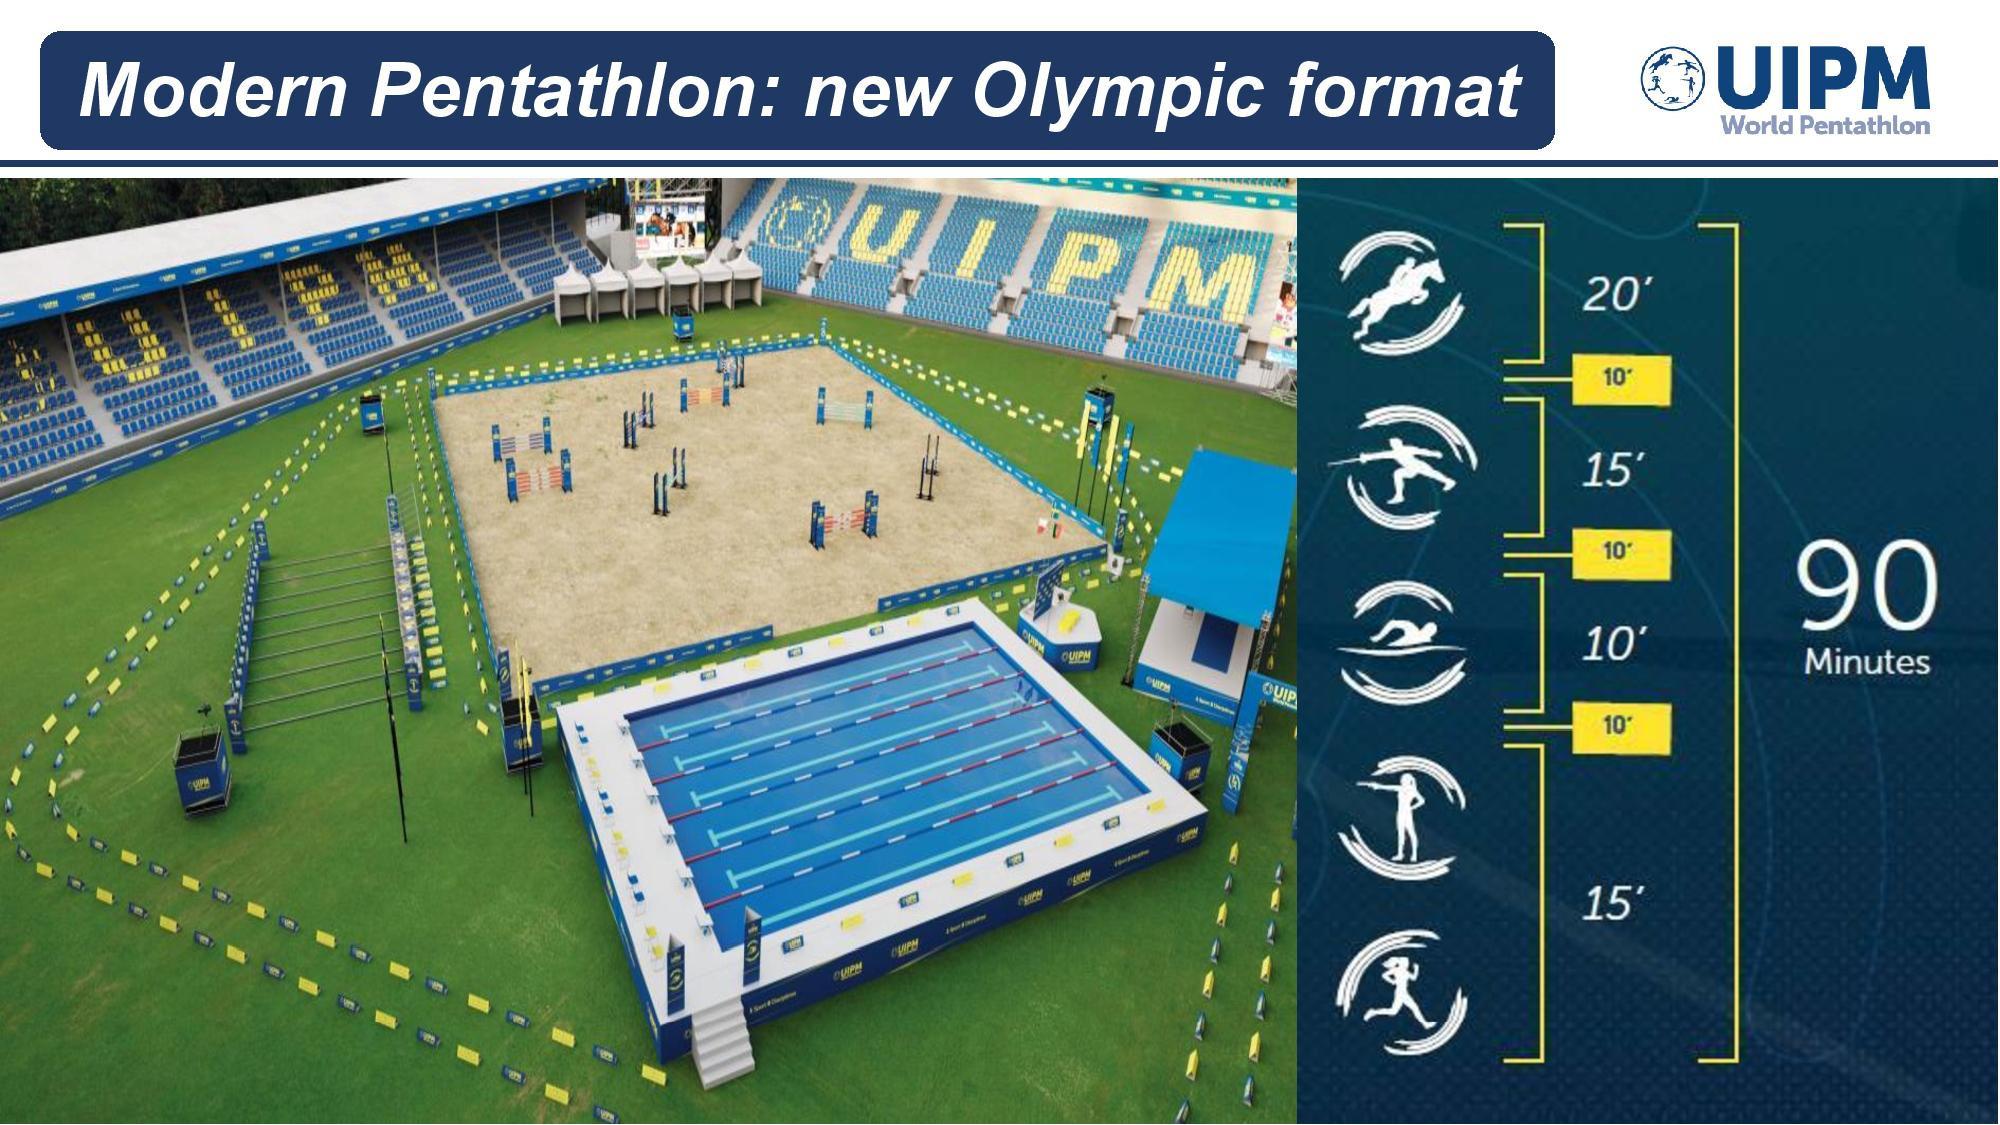 Modern pentathlon's proposed new field of play for Paris 2024 ©UIPM